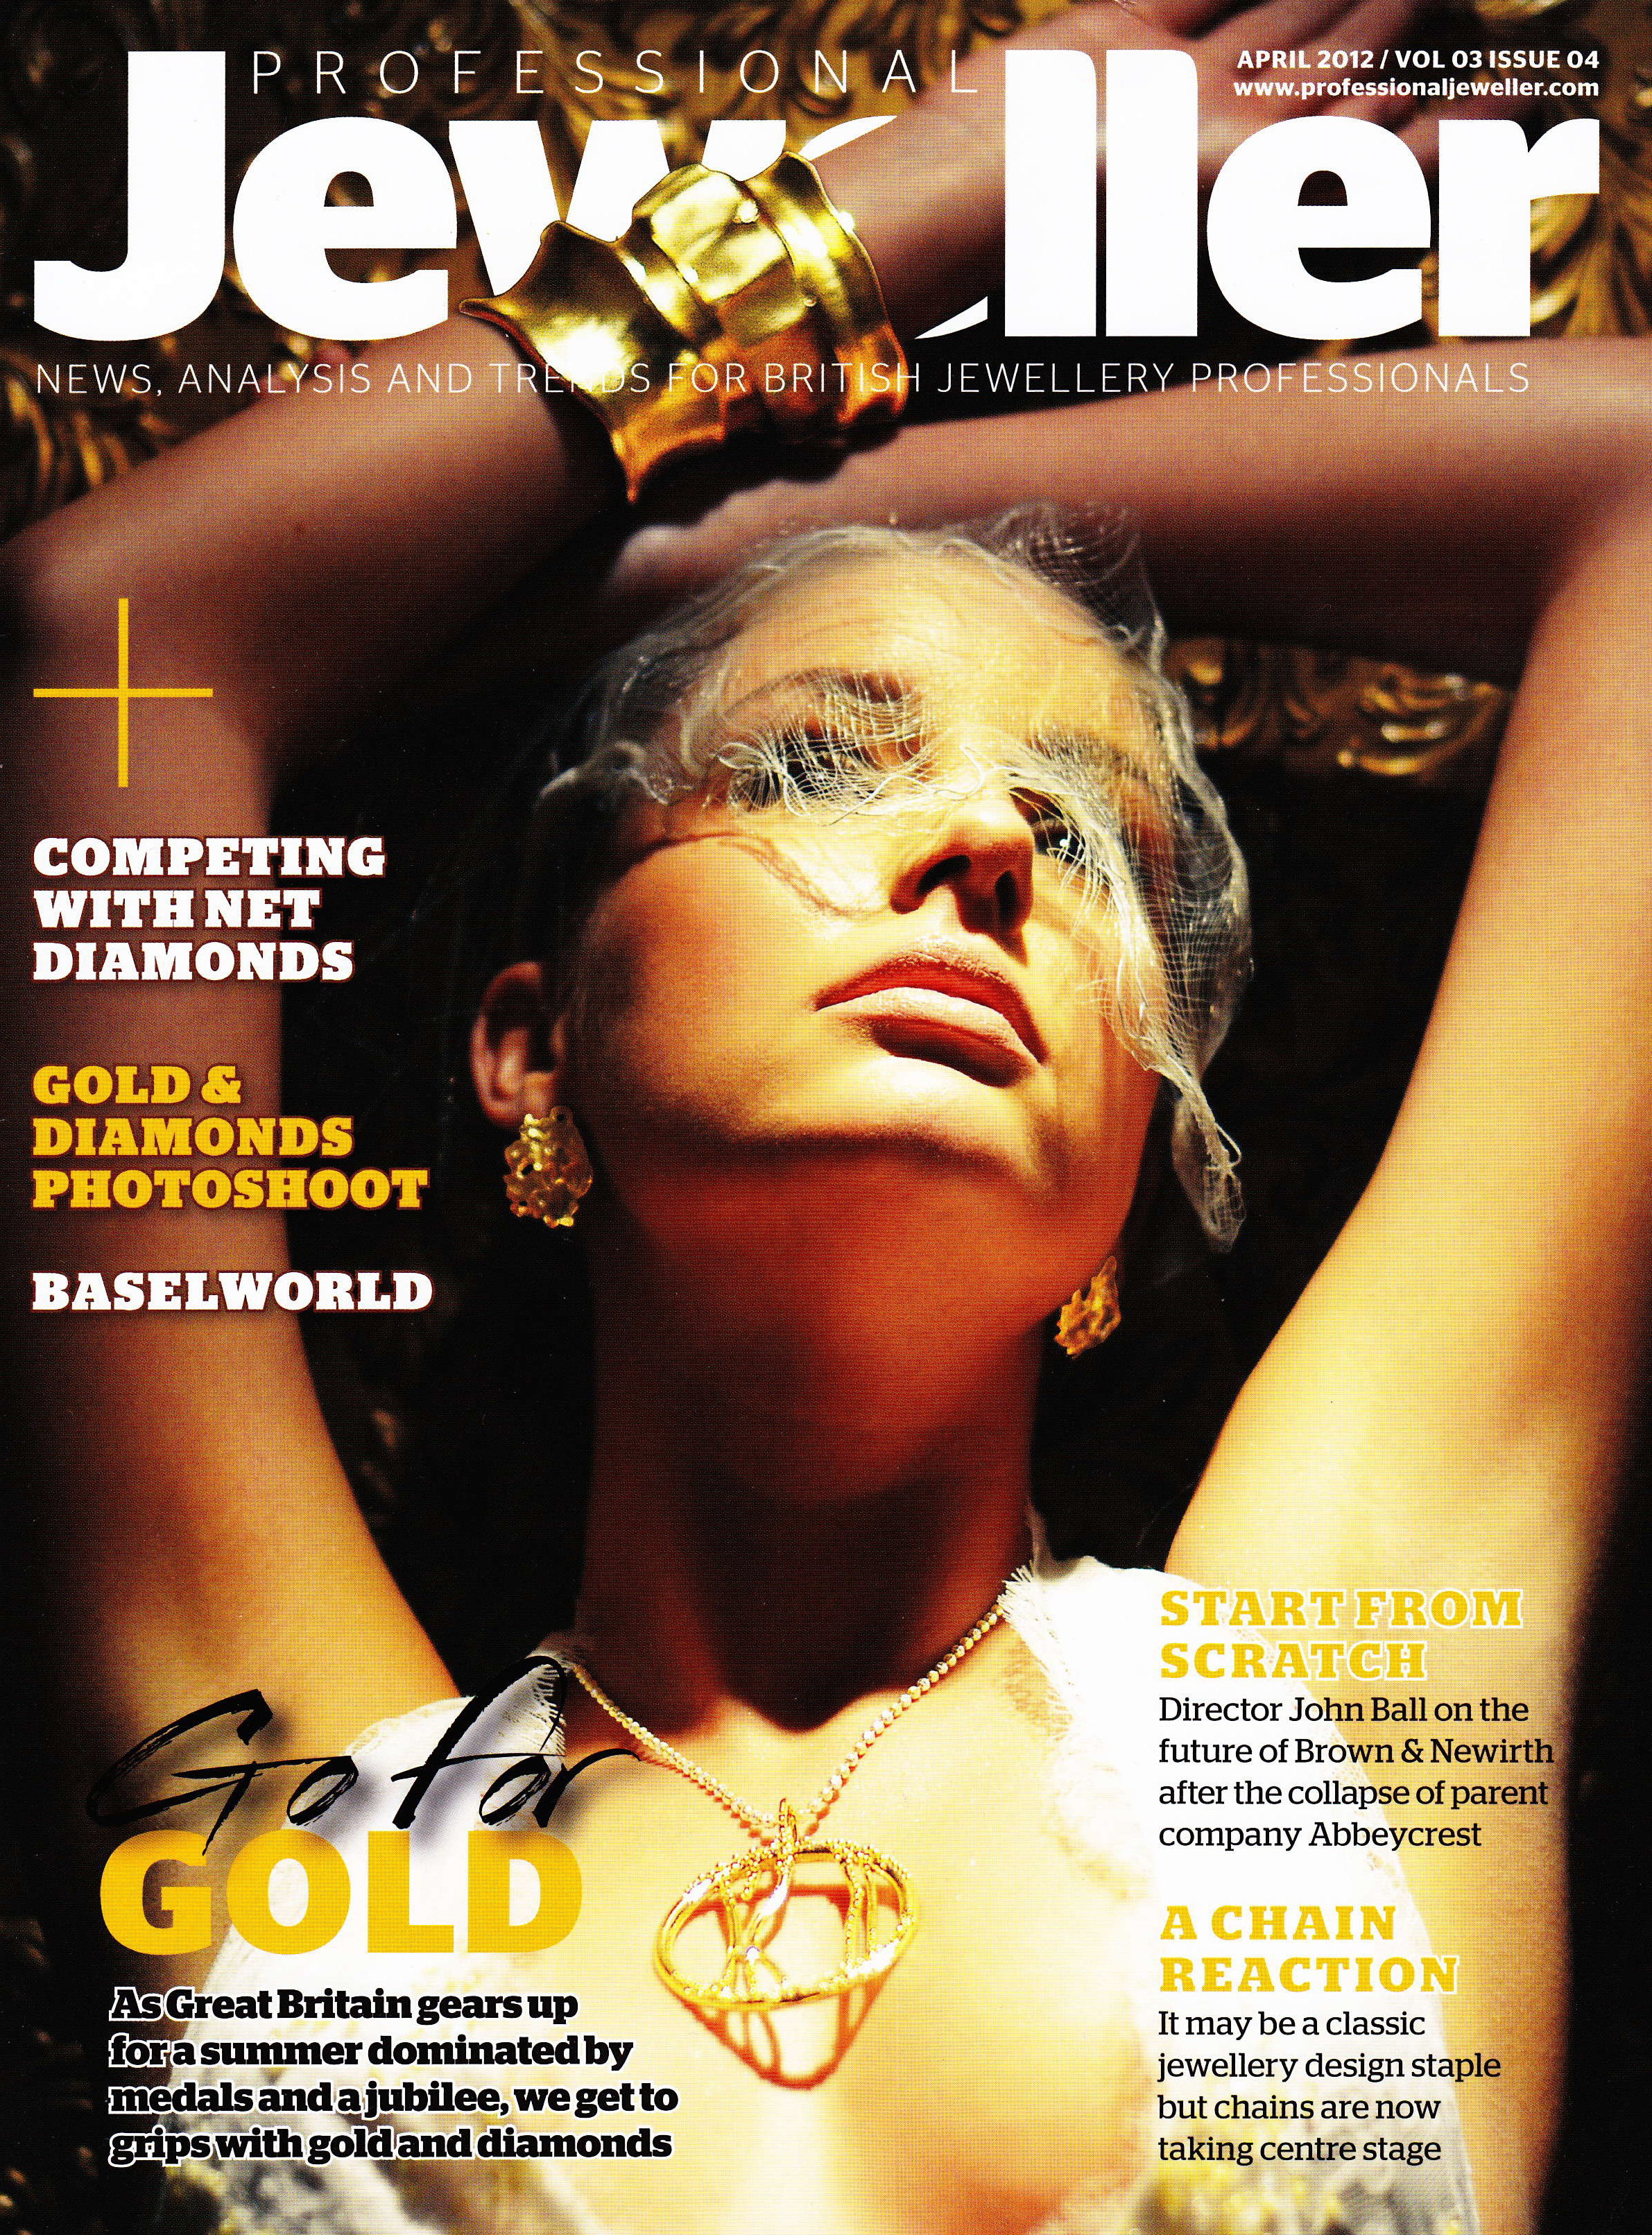 pro jeweller front cover.jpg